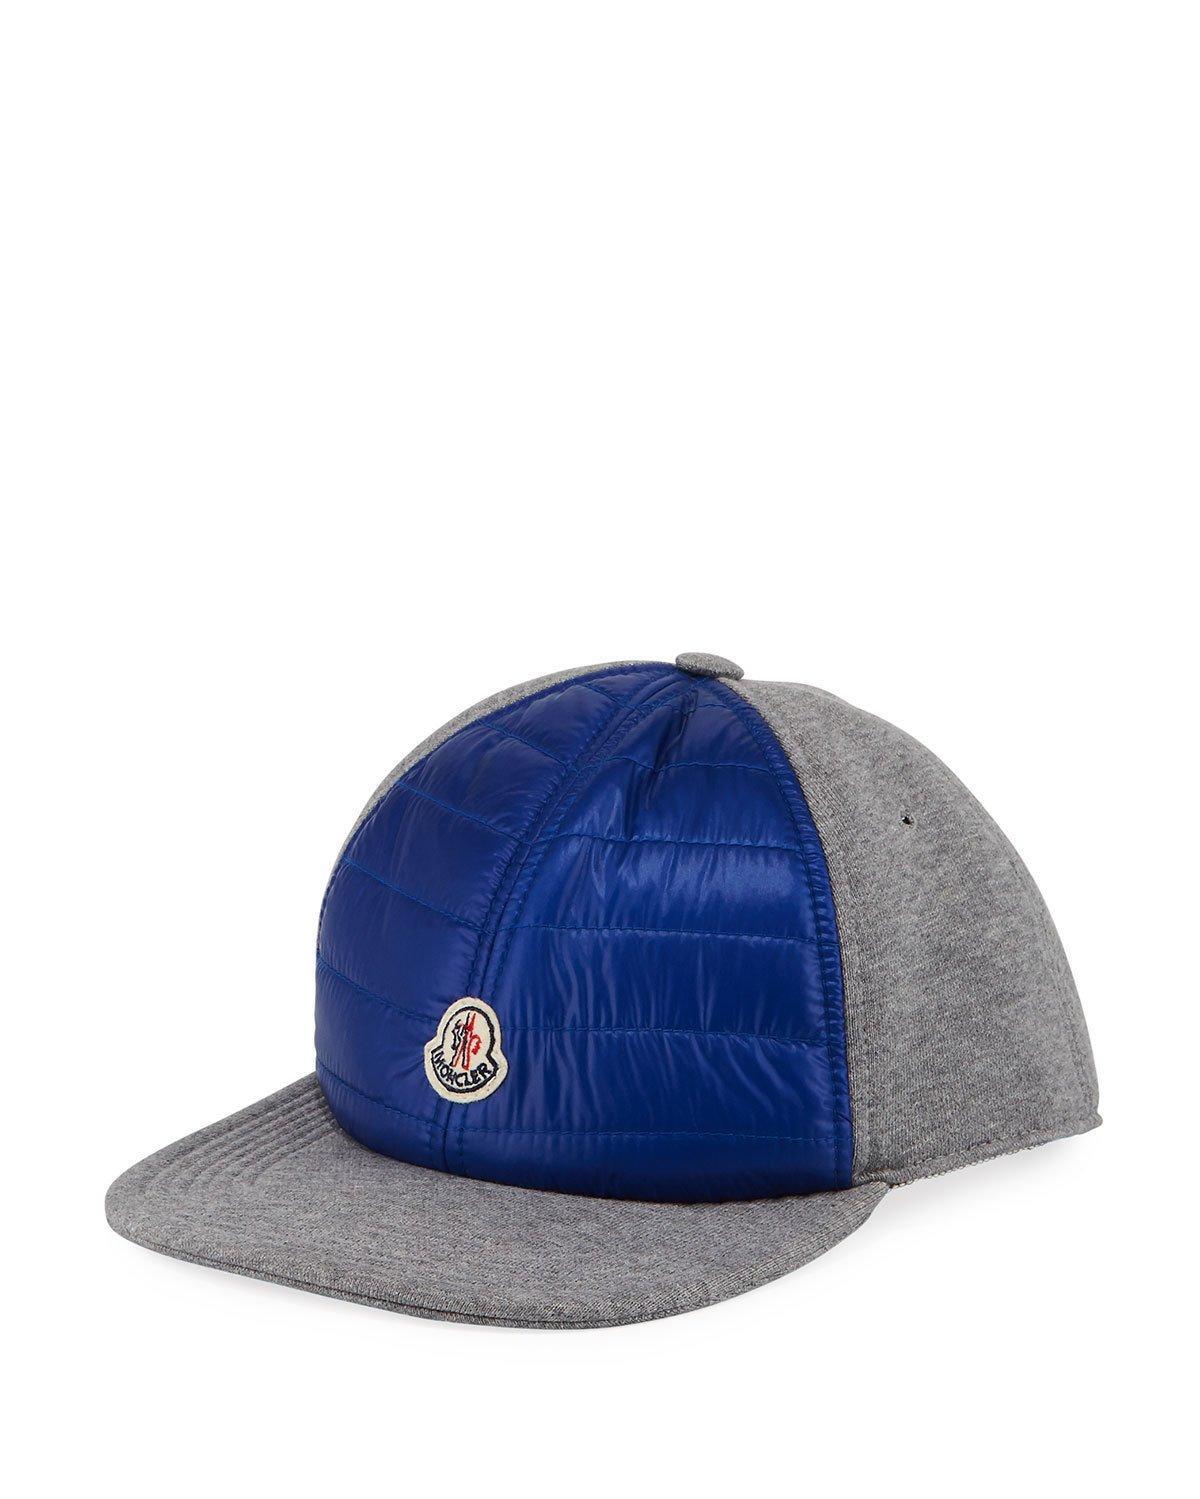 Moncler Men S Berretto Baseball Cap In Charcoal  962d961ff573